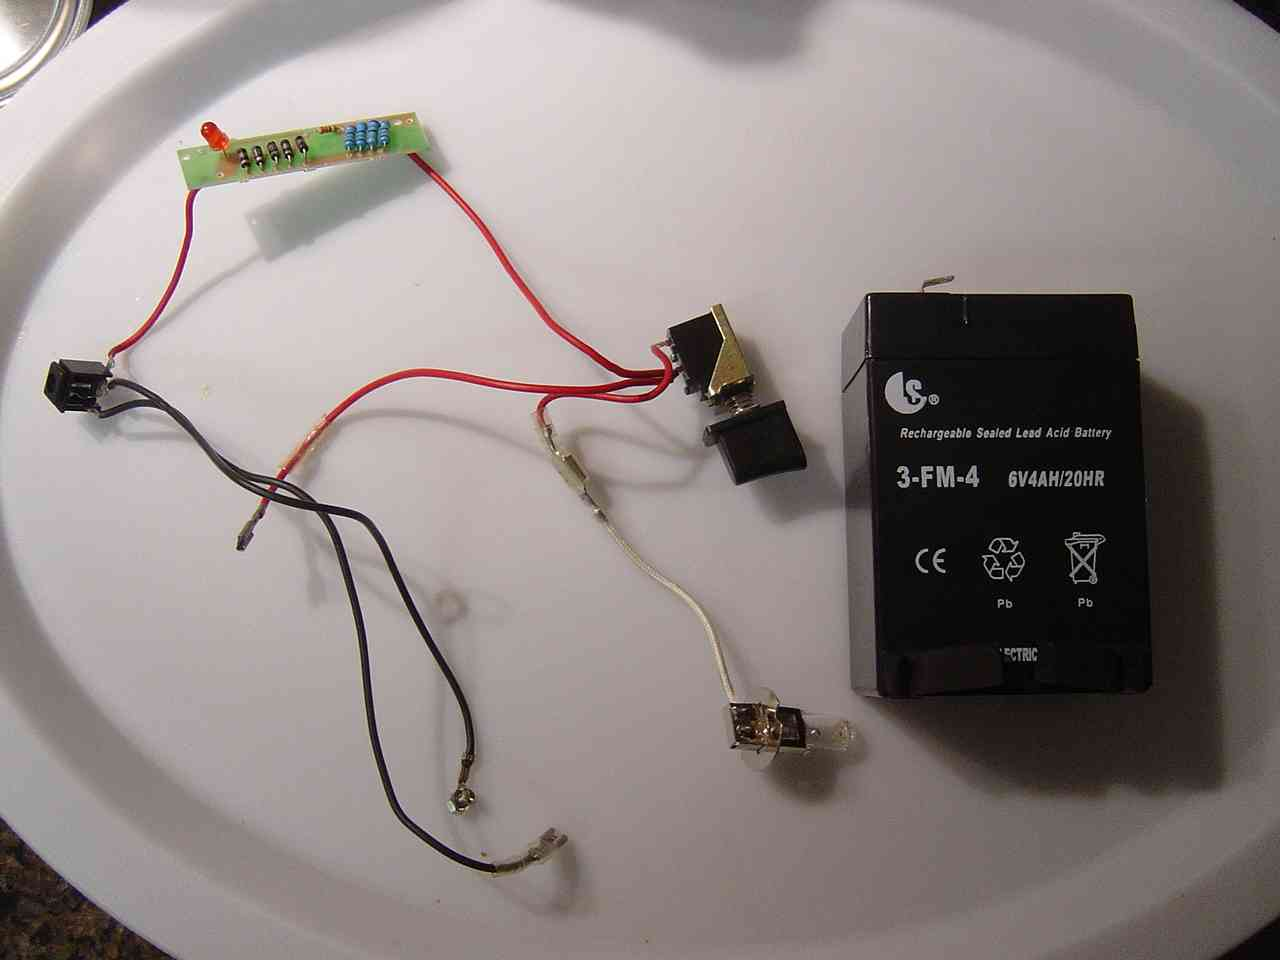 how to fix broken rechargeable spotlight electrical diy chatroom rh diychatroom com Handheld Spotlight Wiring-Diagram Handheld Spotlight Wiring-Diagram